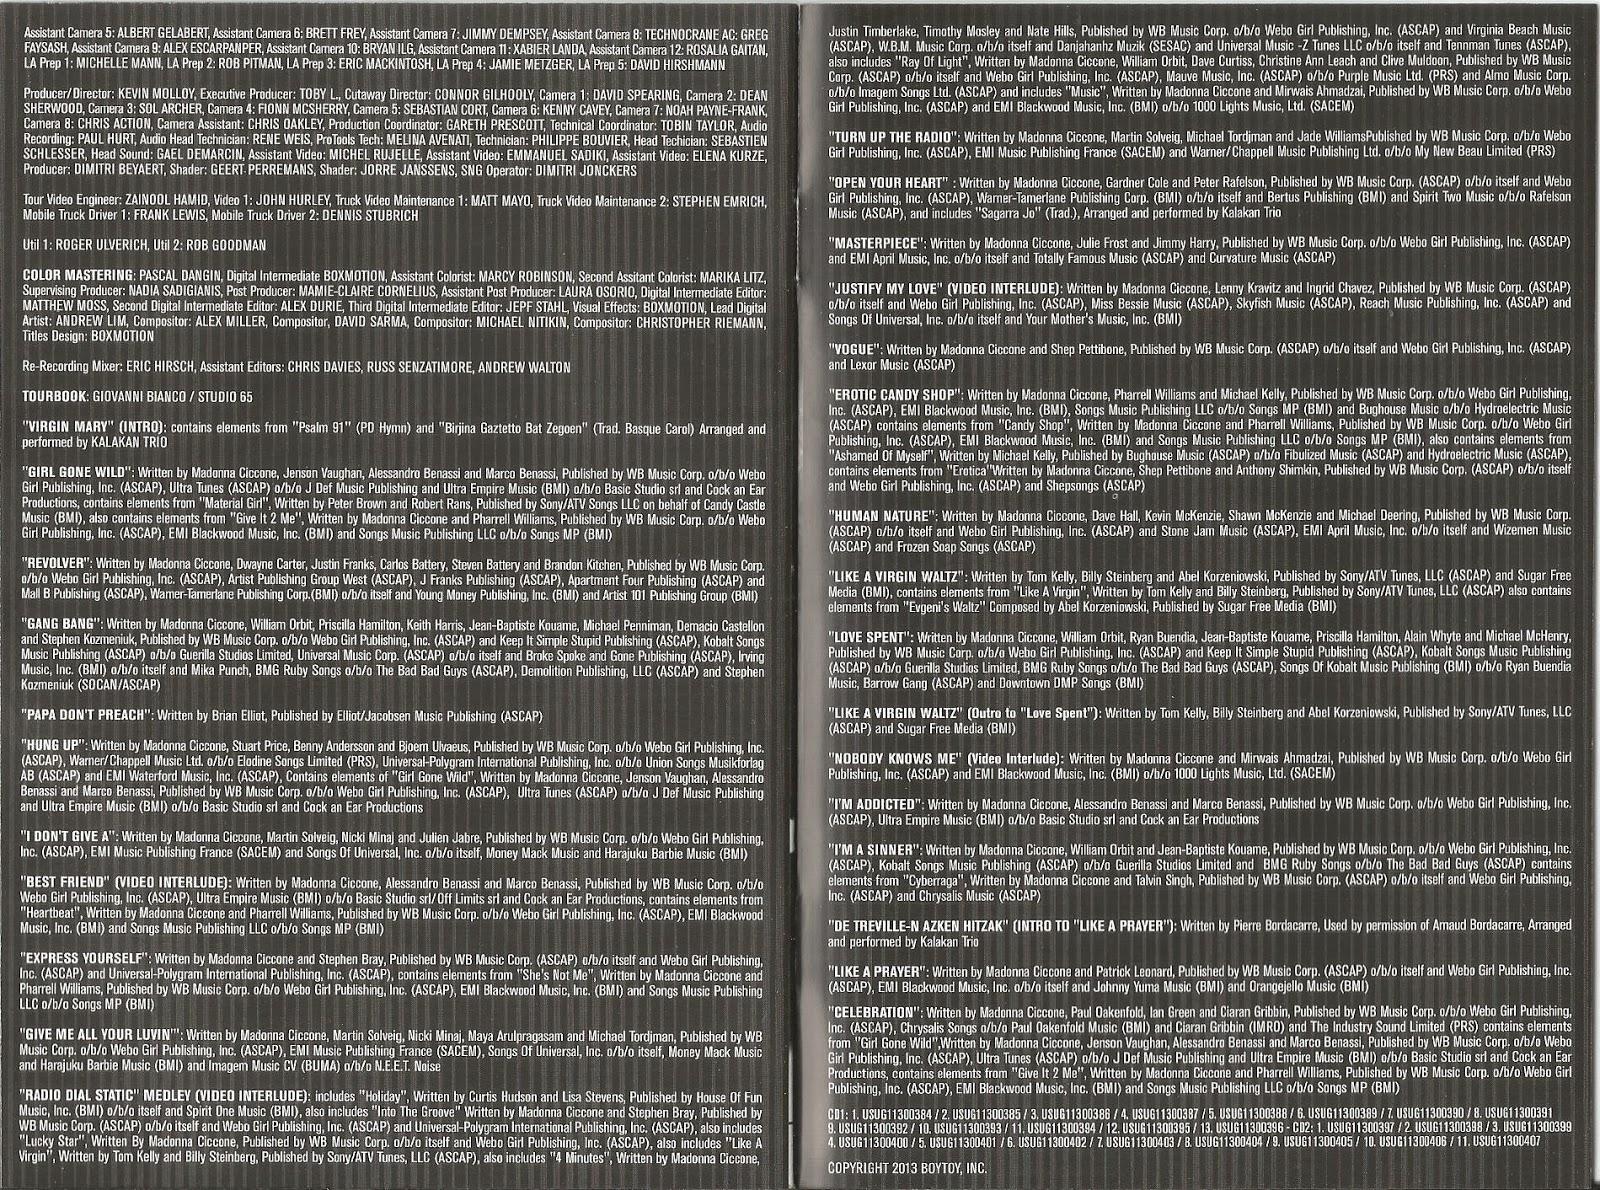 MDNA WORLD TOUR   Blurrei - Blu-Ray, CD, DVD, Livros e muito